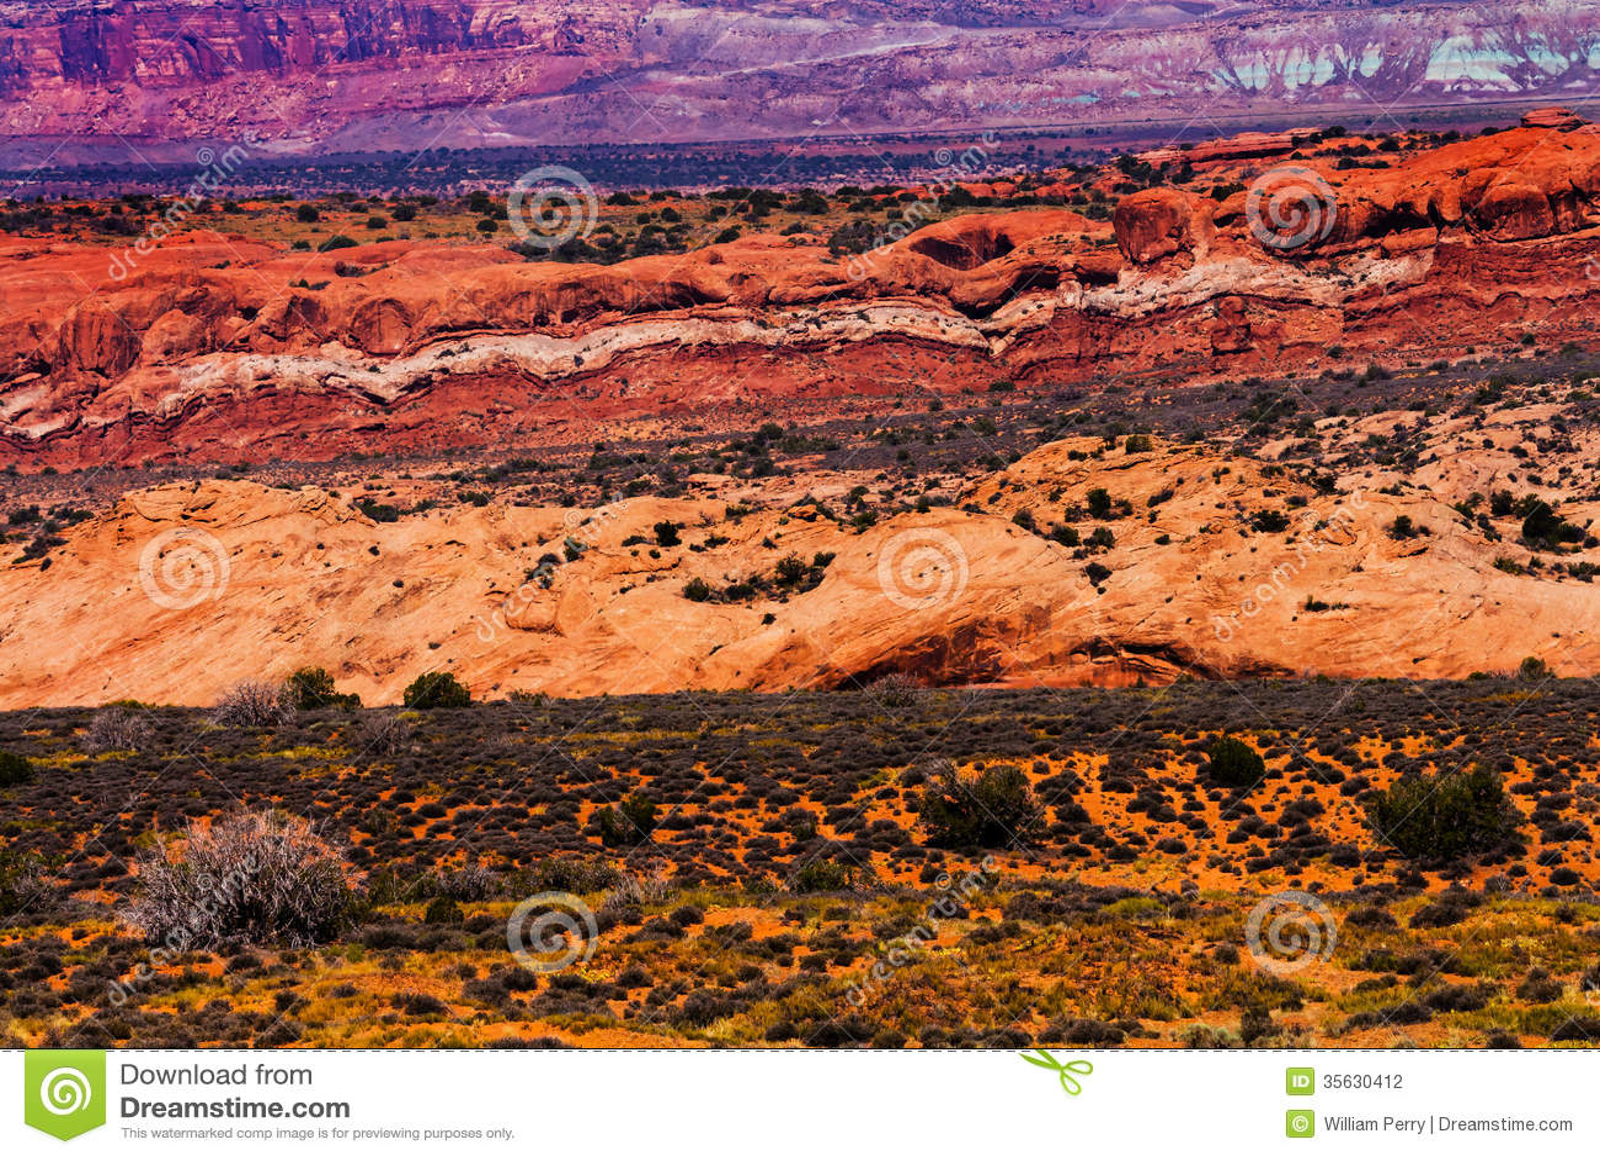 Painted Desert Yellow Orange Red Sandstone Arches National Park Moab Utah